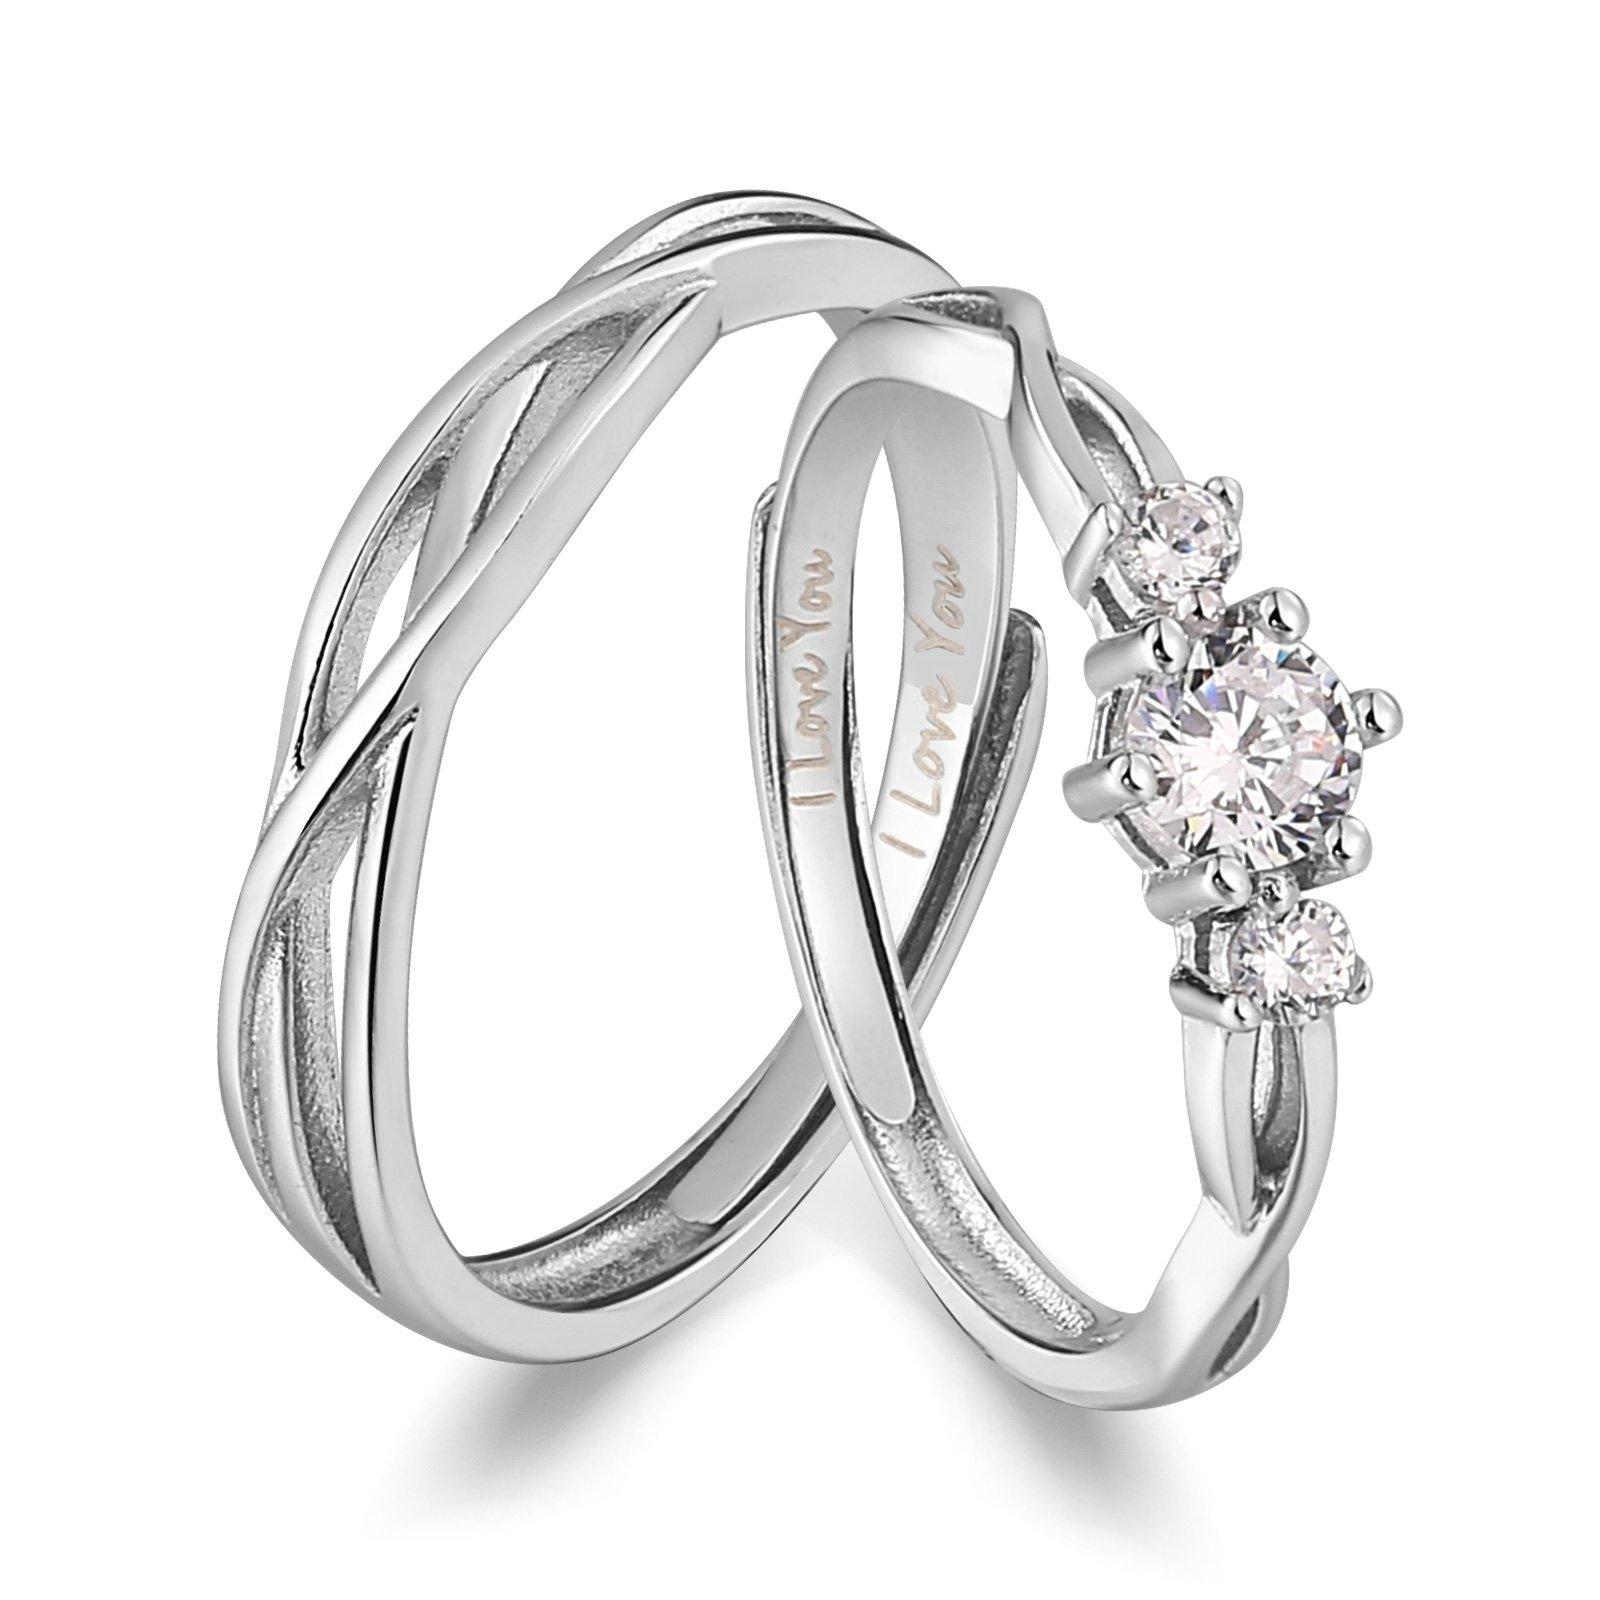 ANAZOZ Sterling Zirconia Engagement Matching